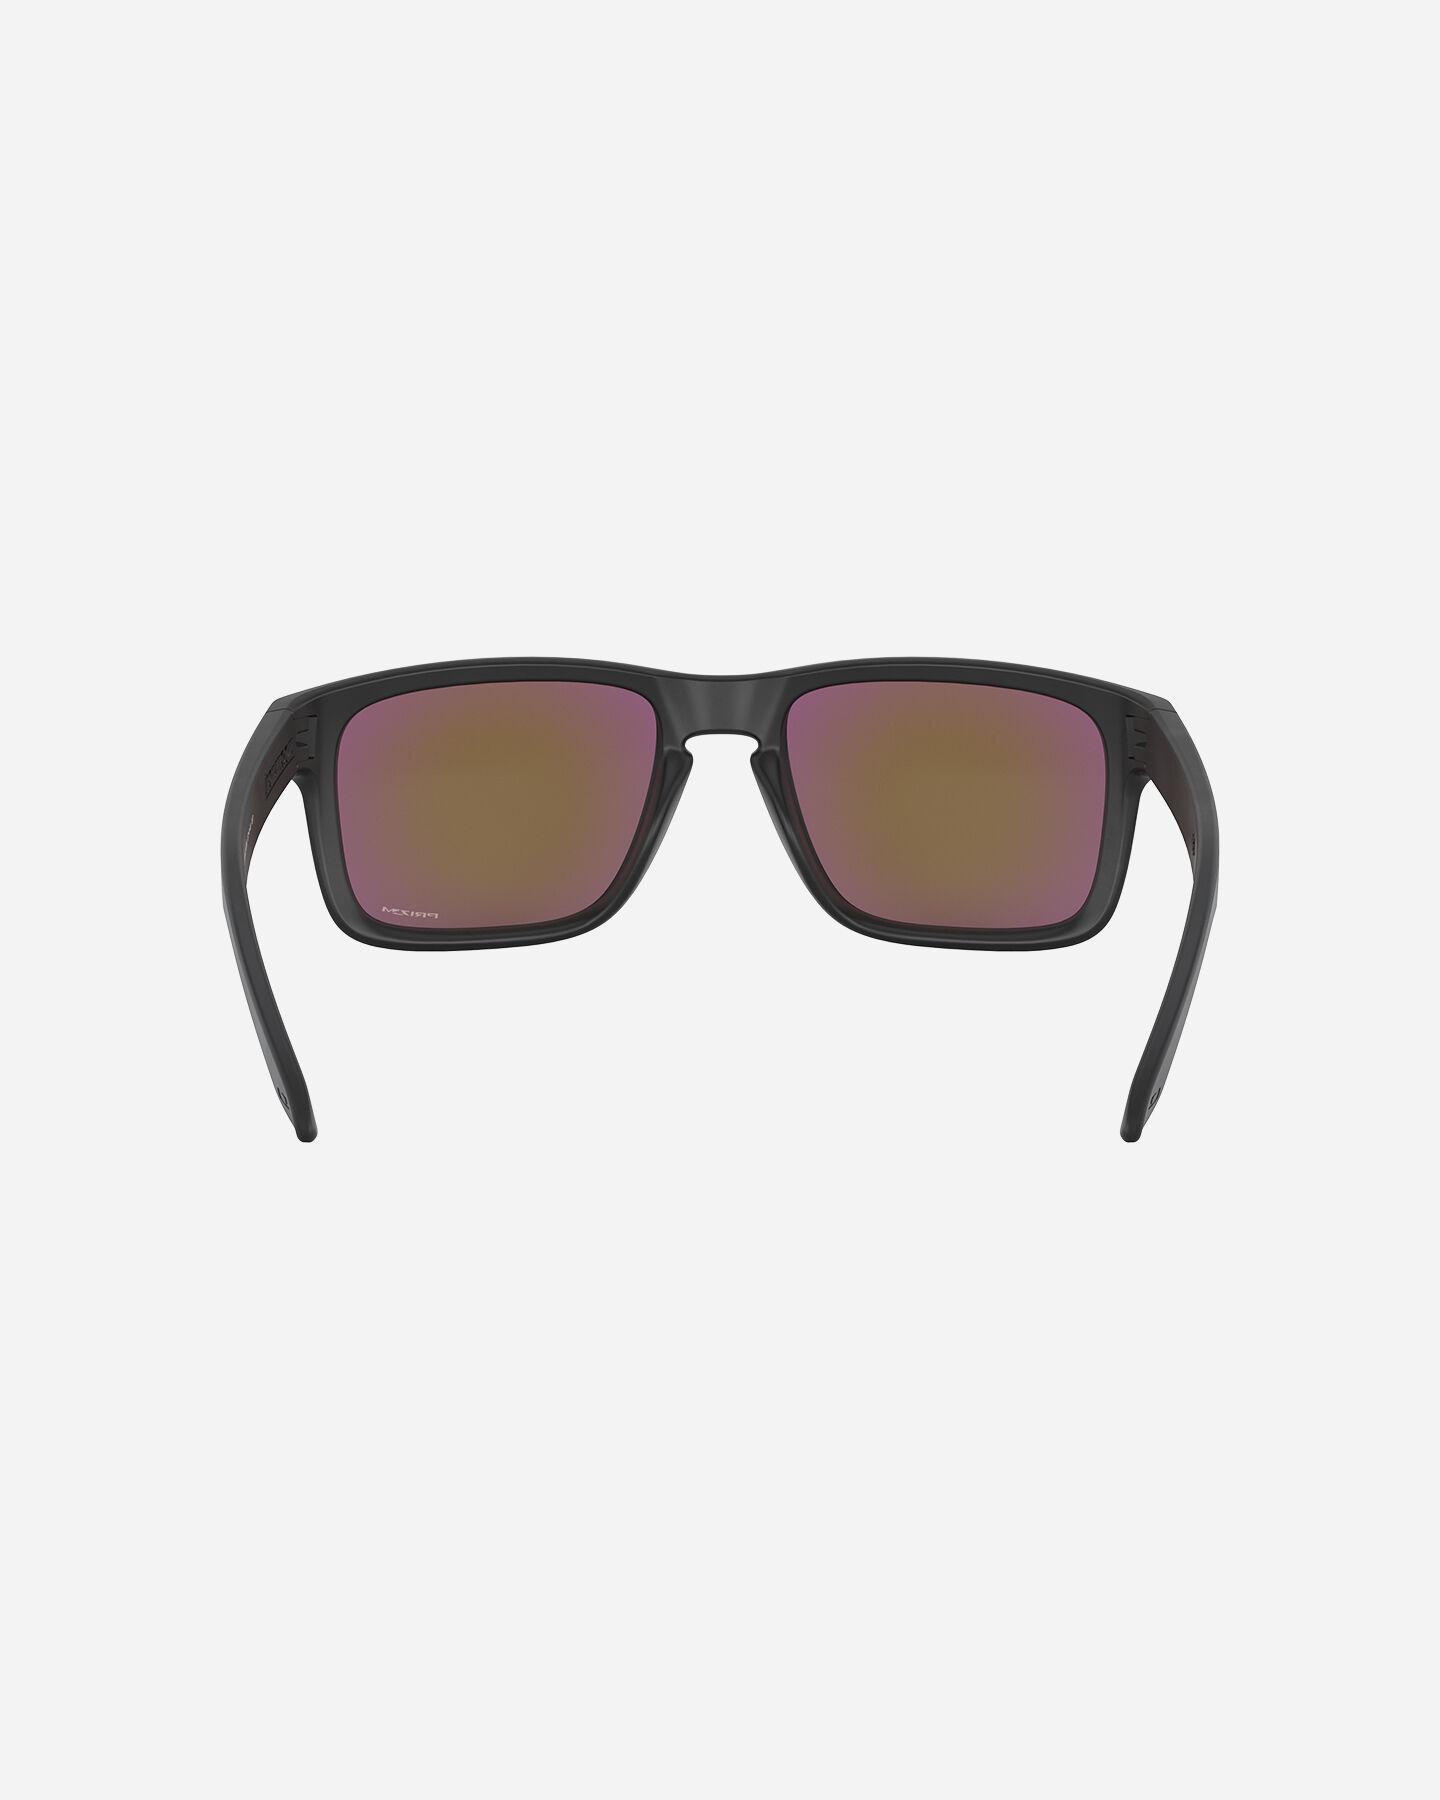 Occhiali OAKLEY HOLBROOK M S5262394|K655|55 scatto 2